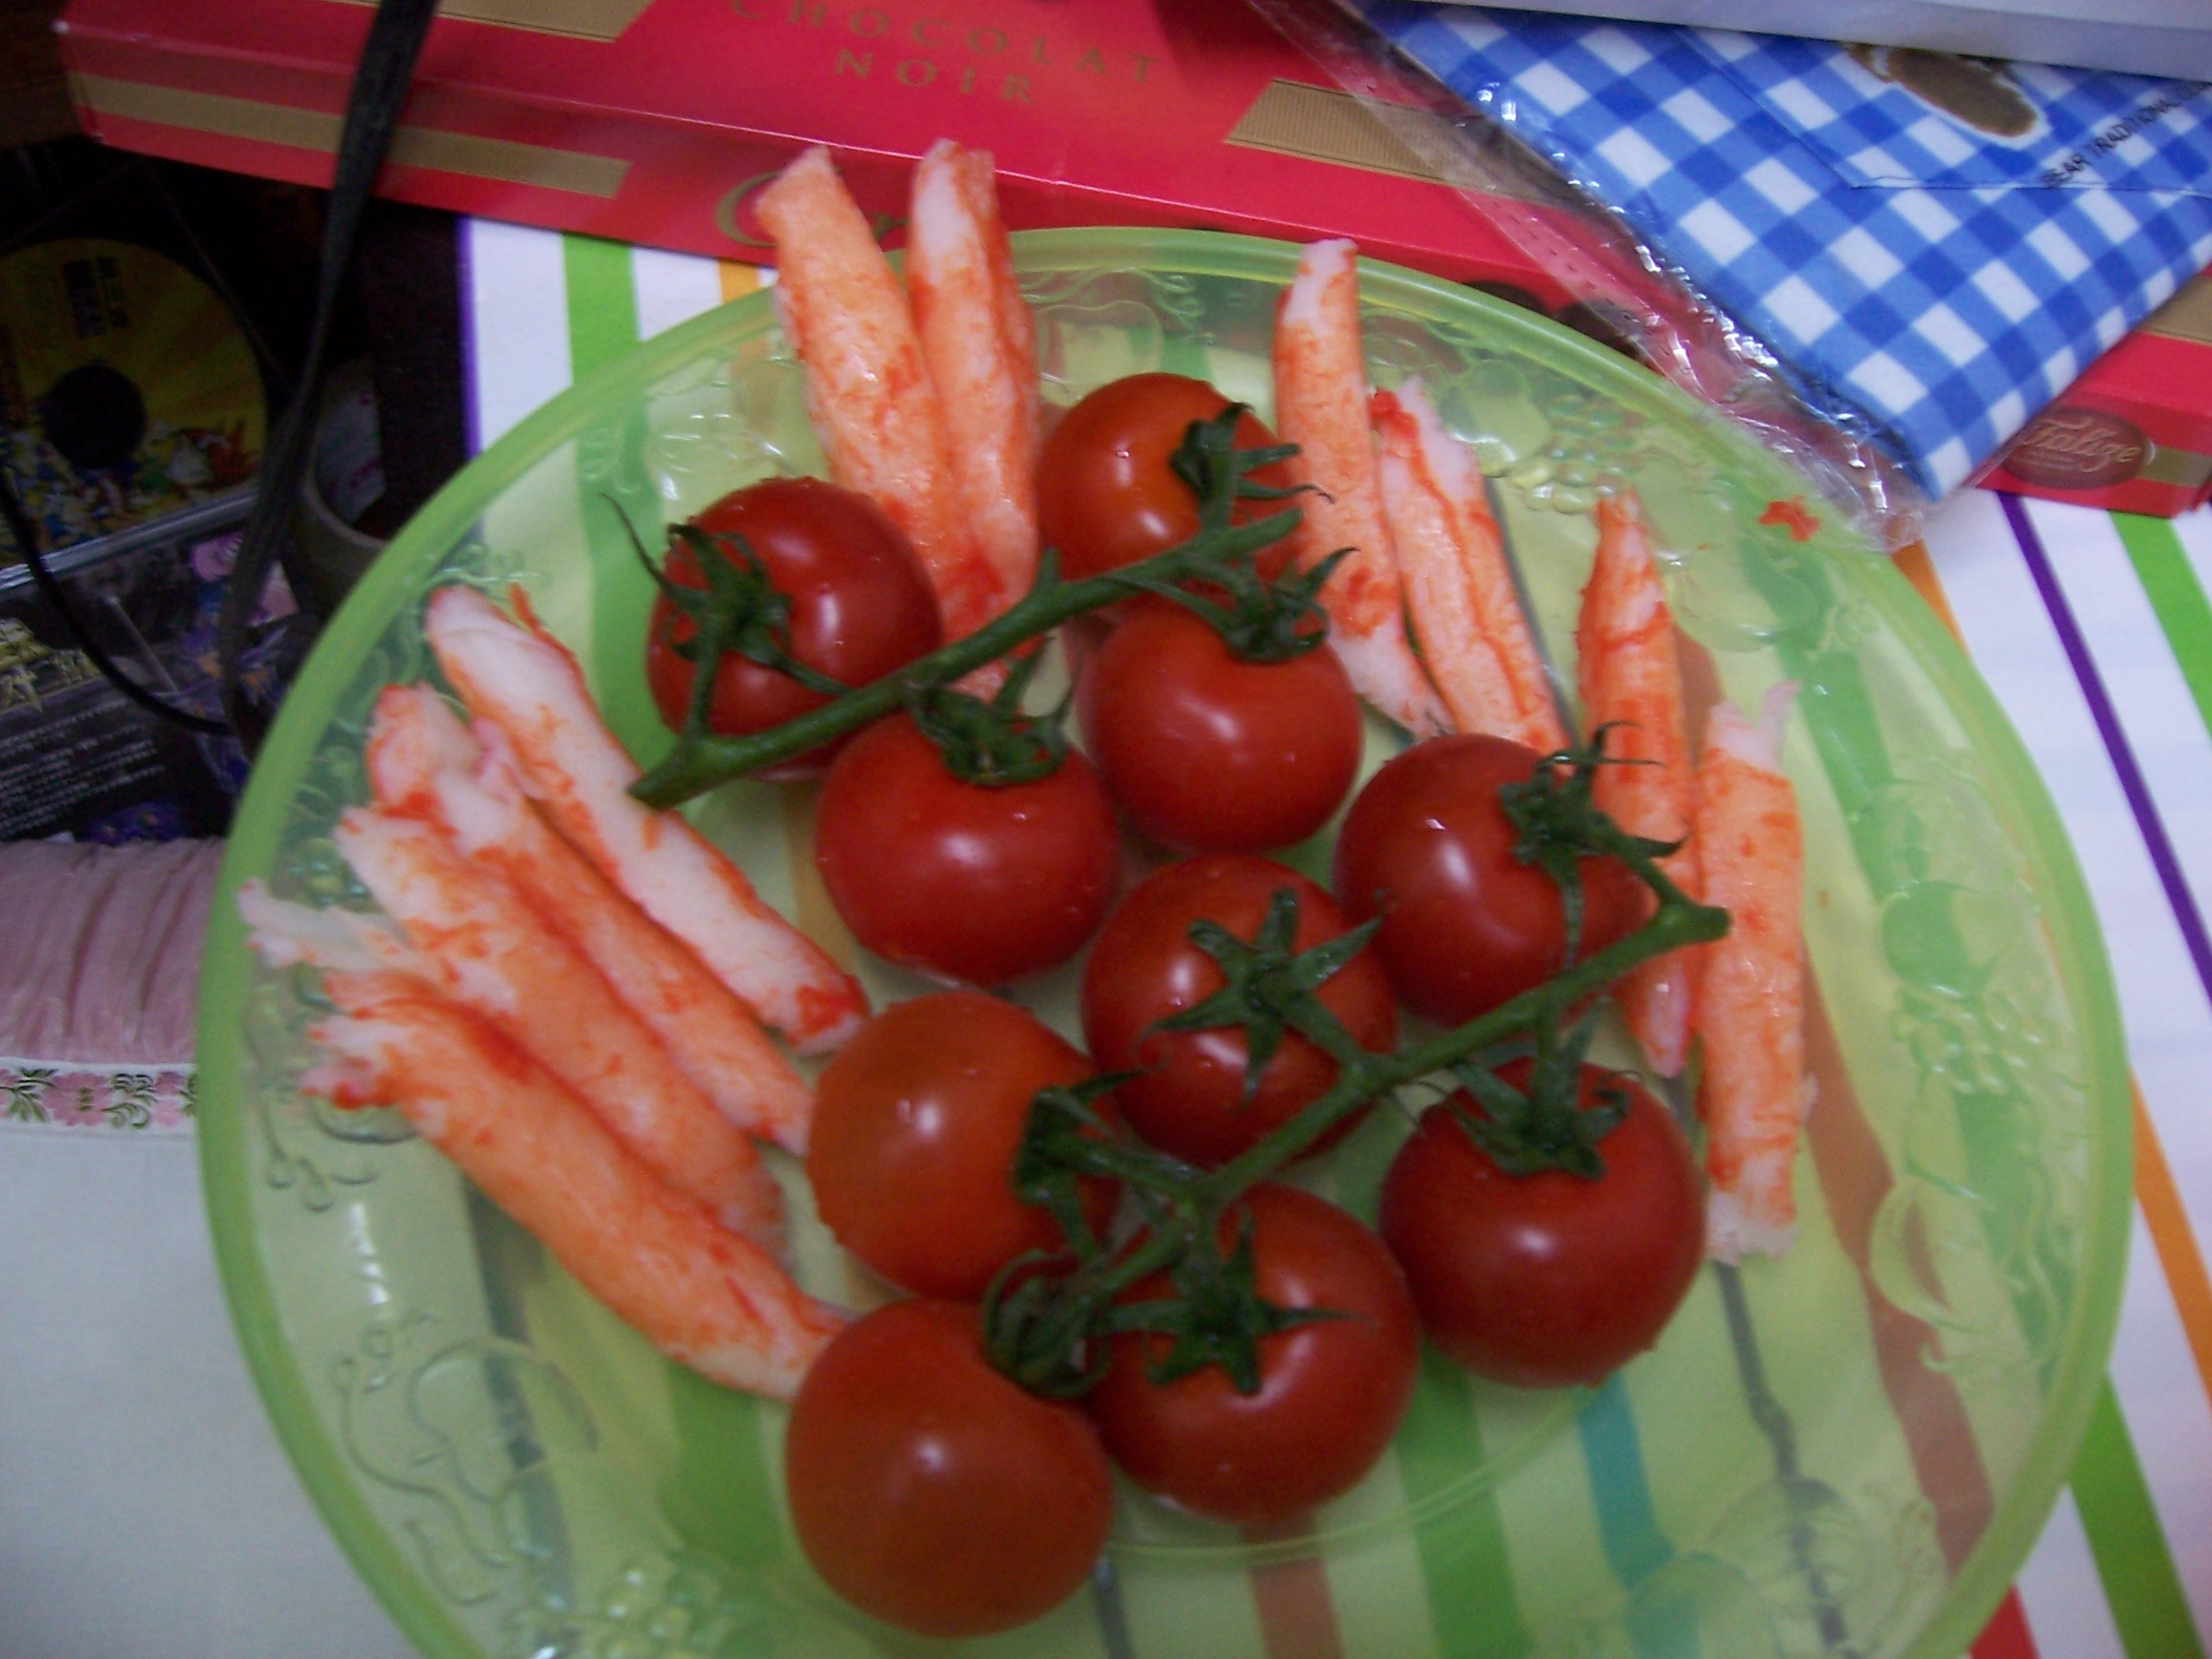 Tomato and crab